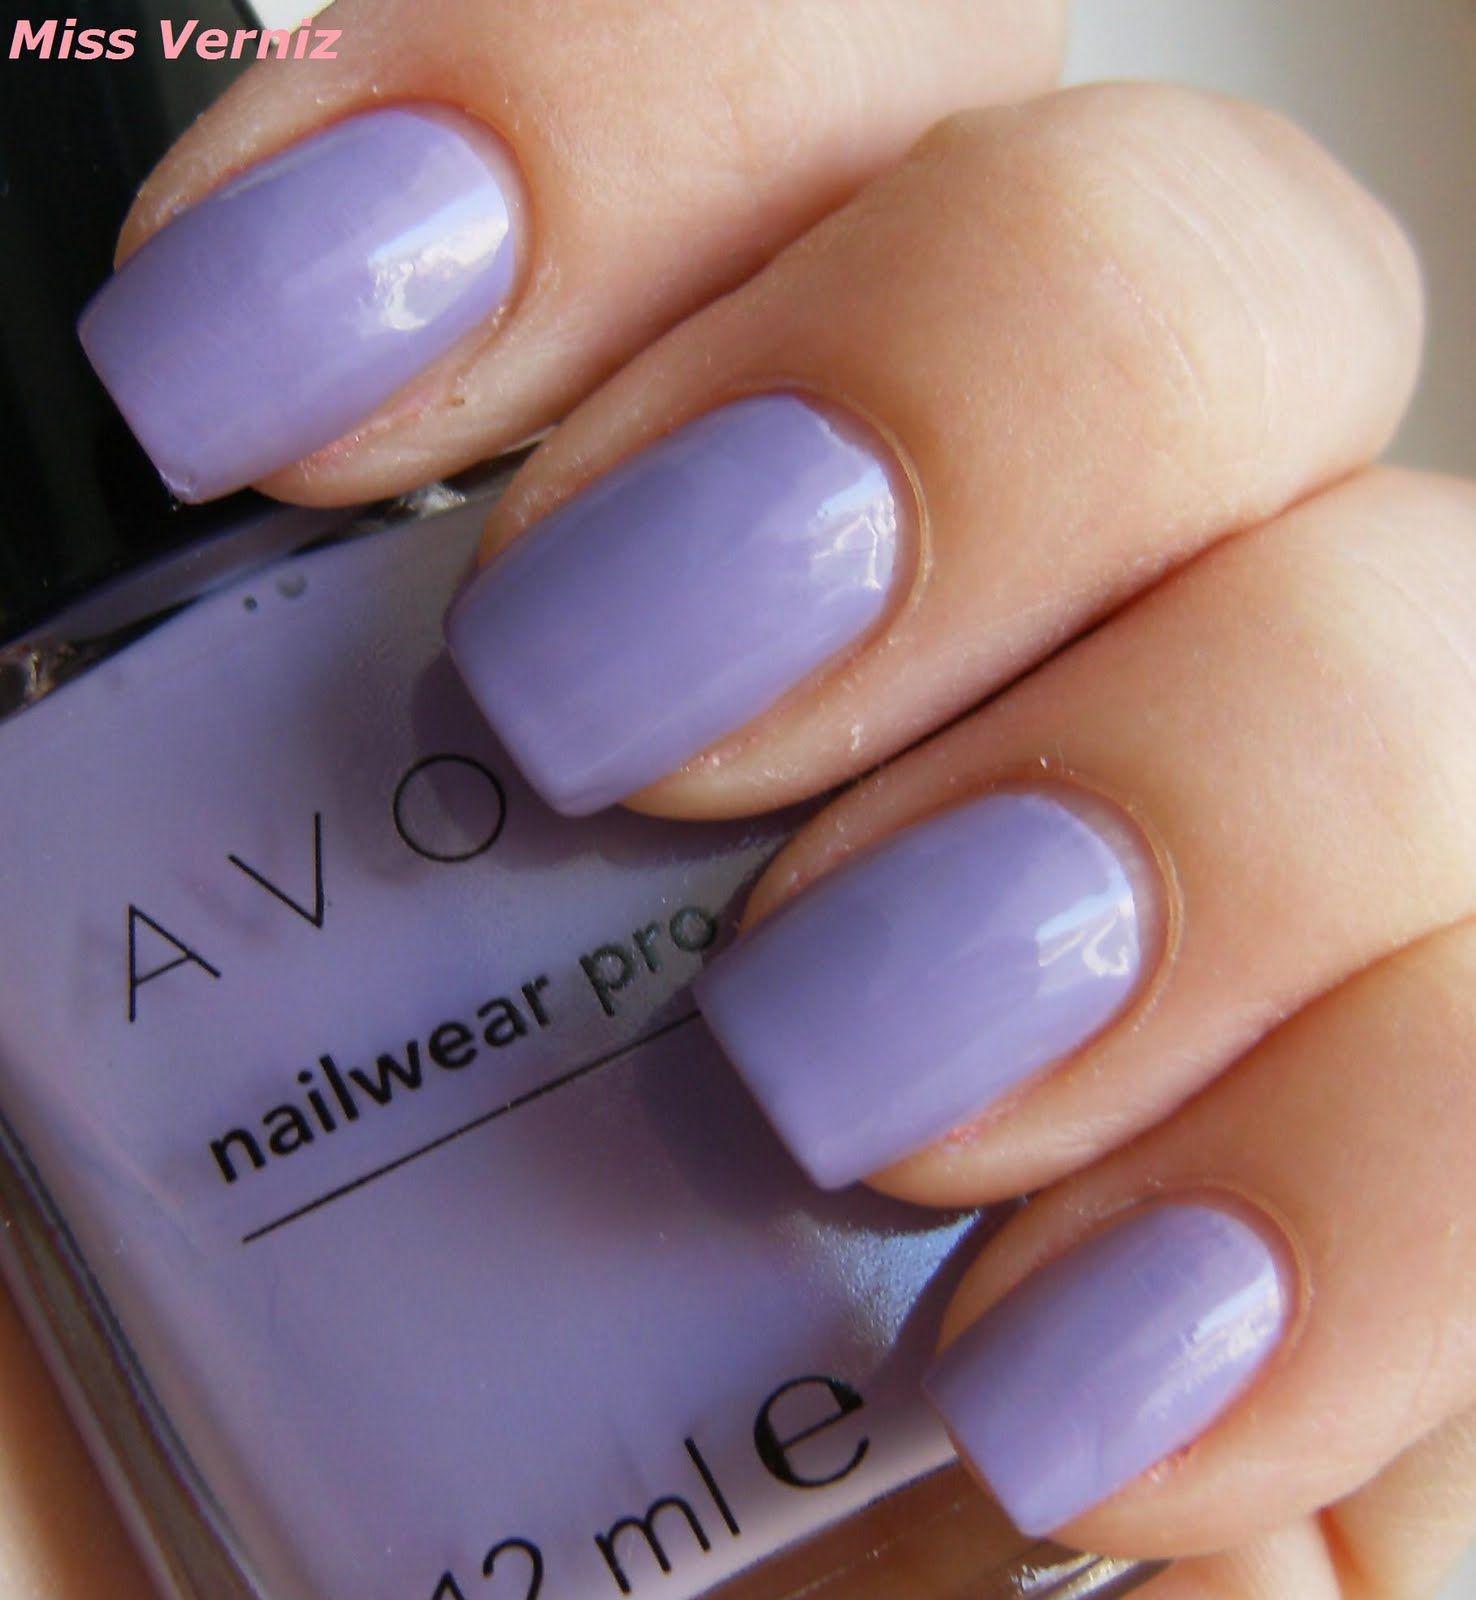 culture purple avon - Buscar con Google   uñas   Pinterest   Avon ...